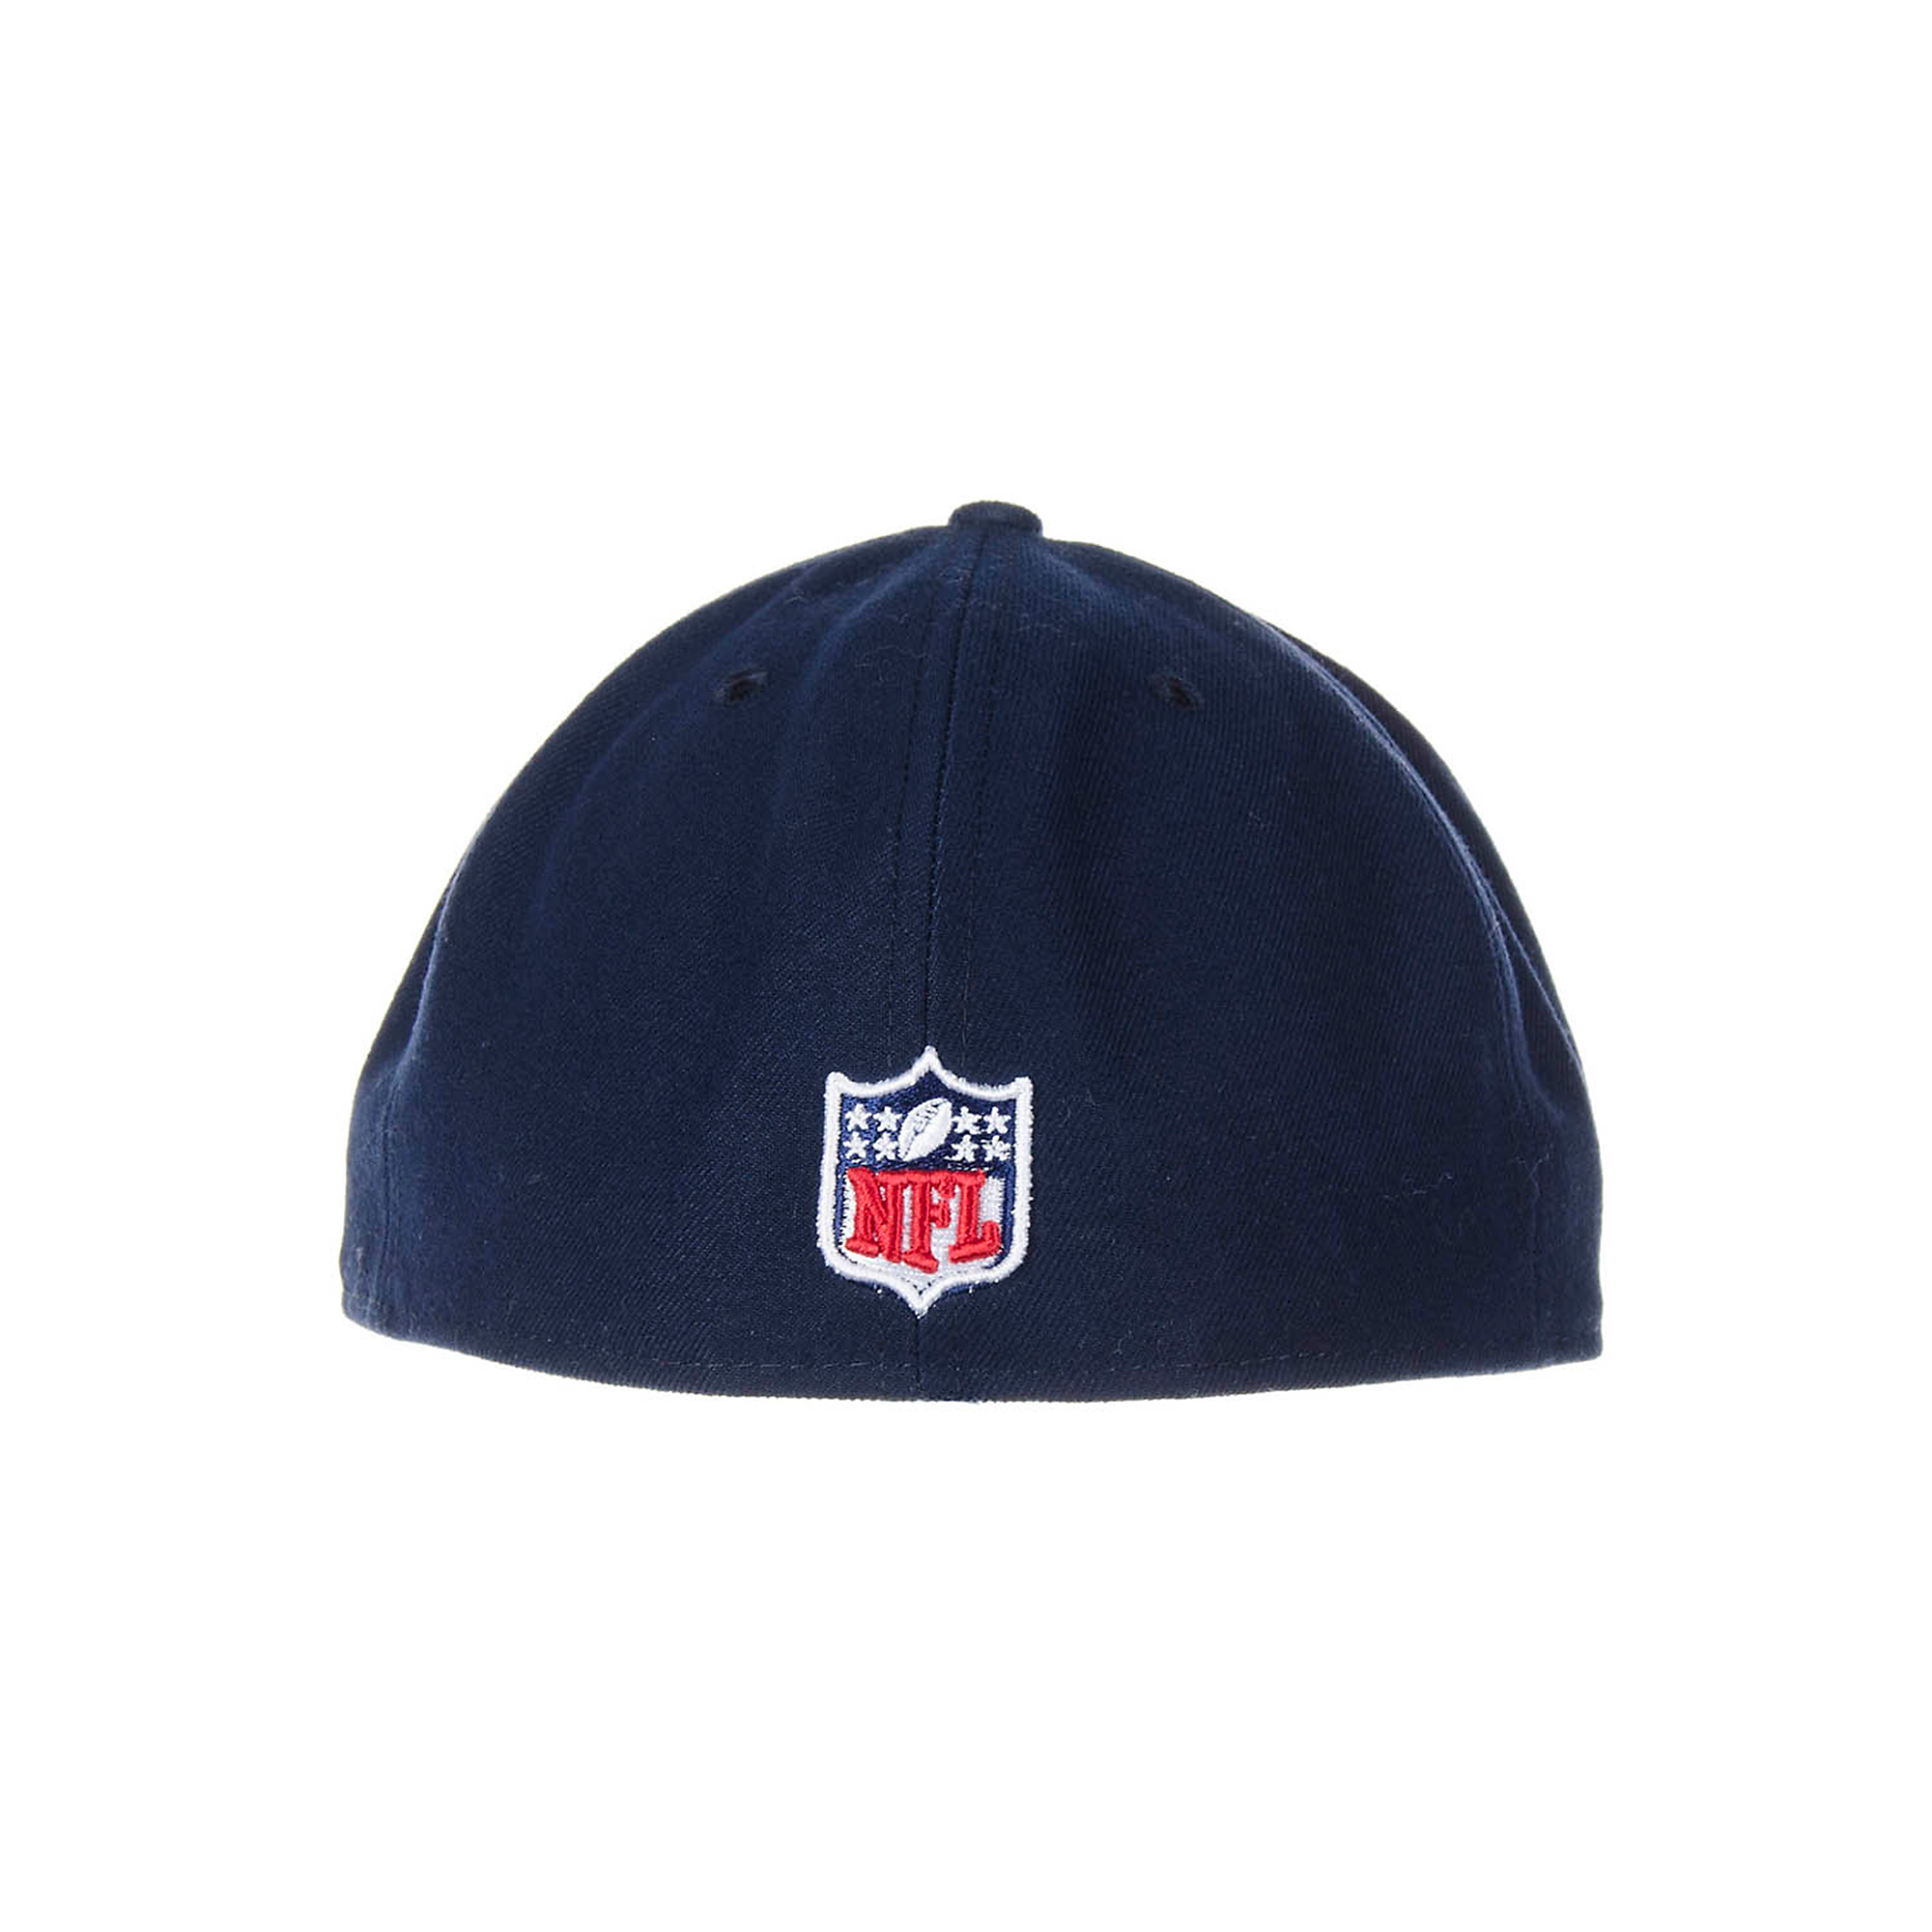 Dallas Cowboys New Era 59Fifty Sideline Cap ... cd1c31e0bae1